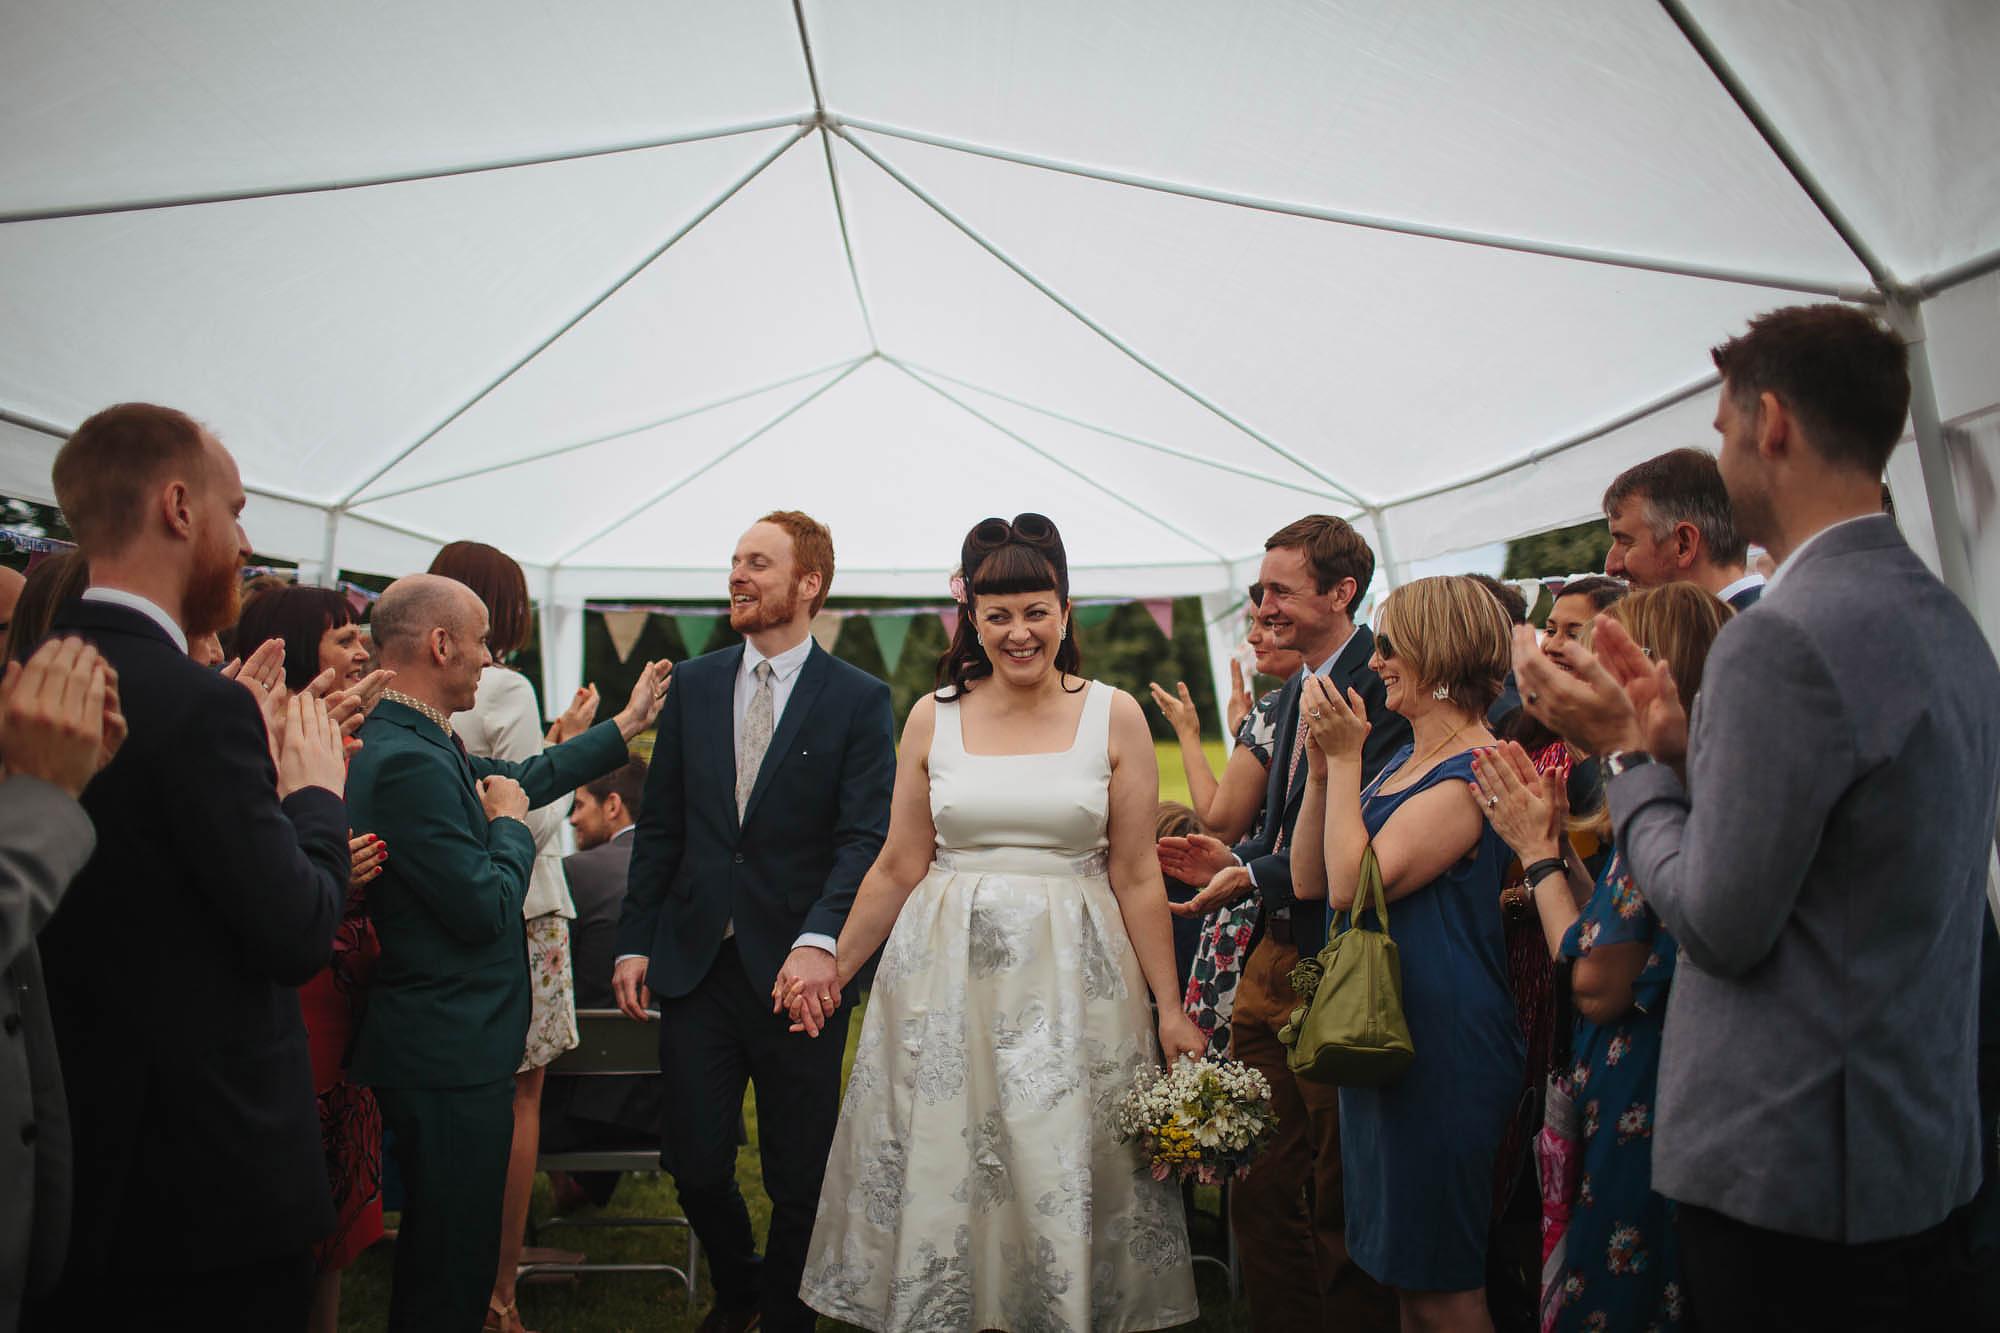 Leeds Yorkshire Wedding Photographer Married Bride Groom Smile